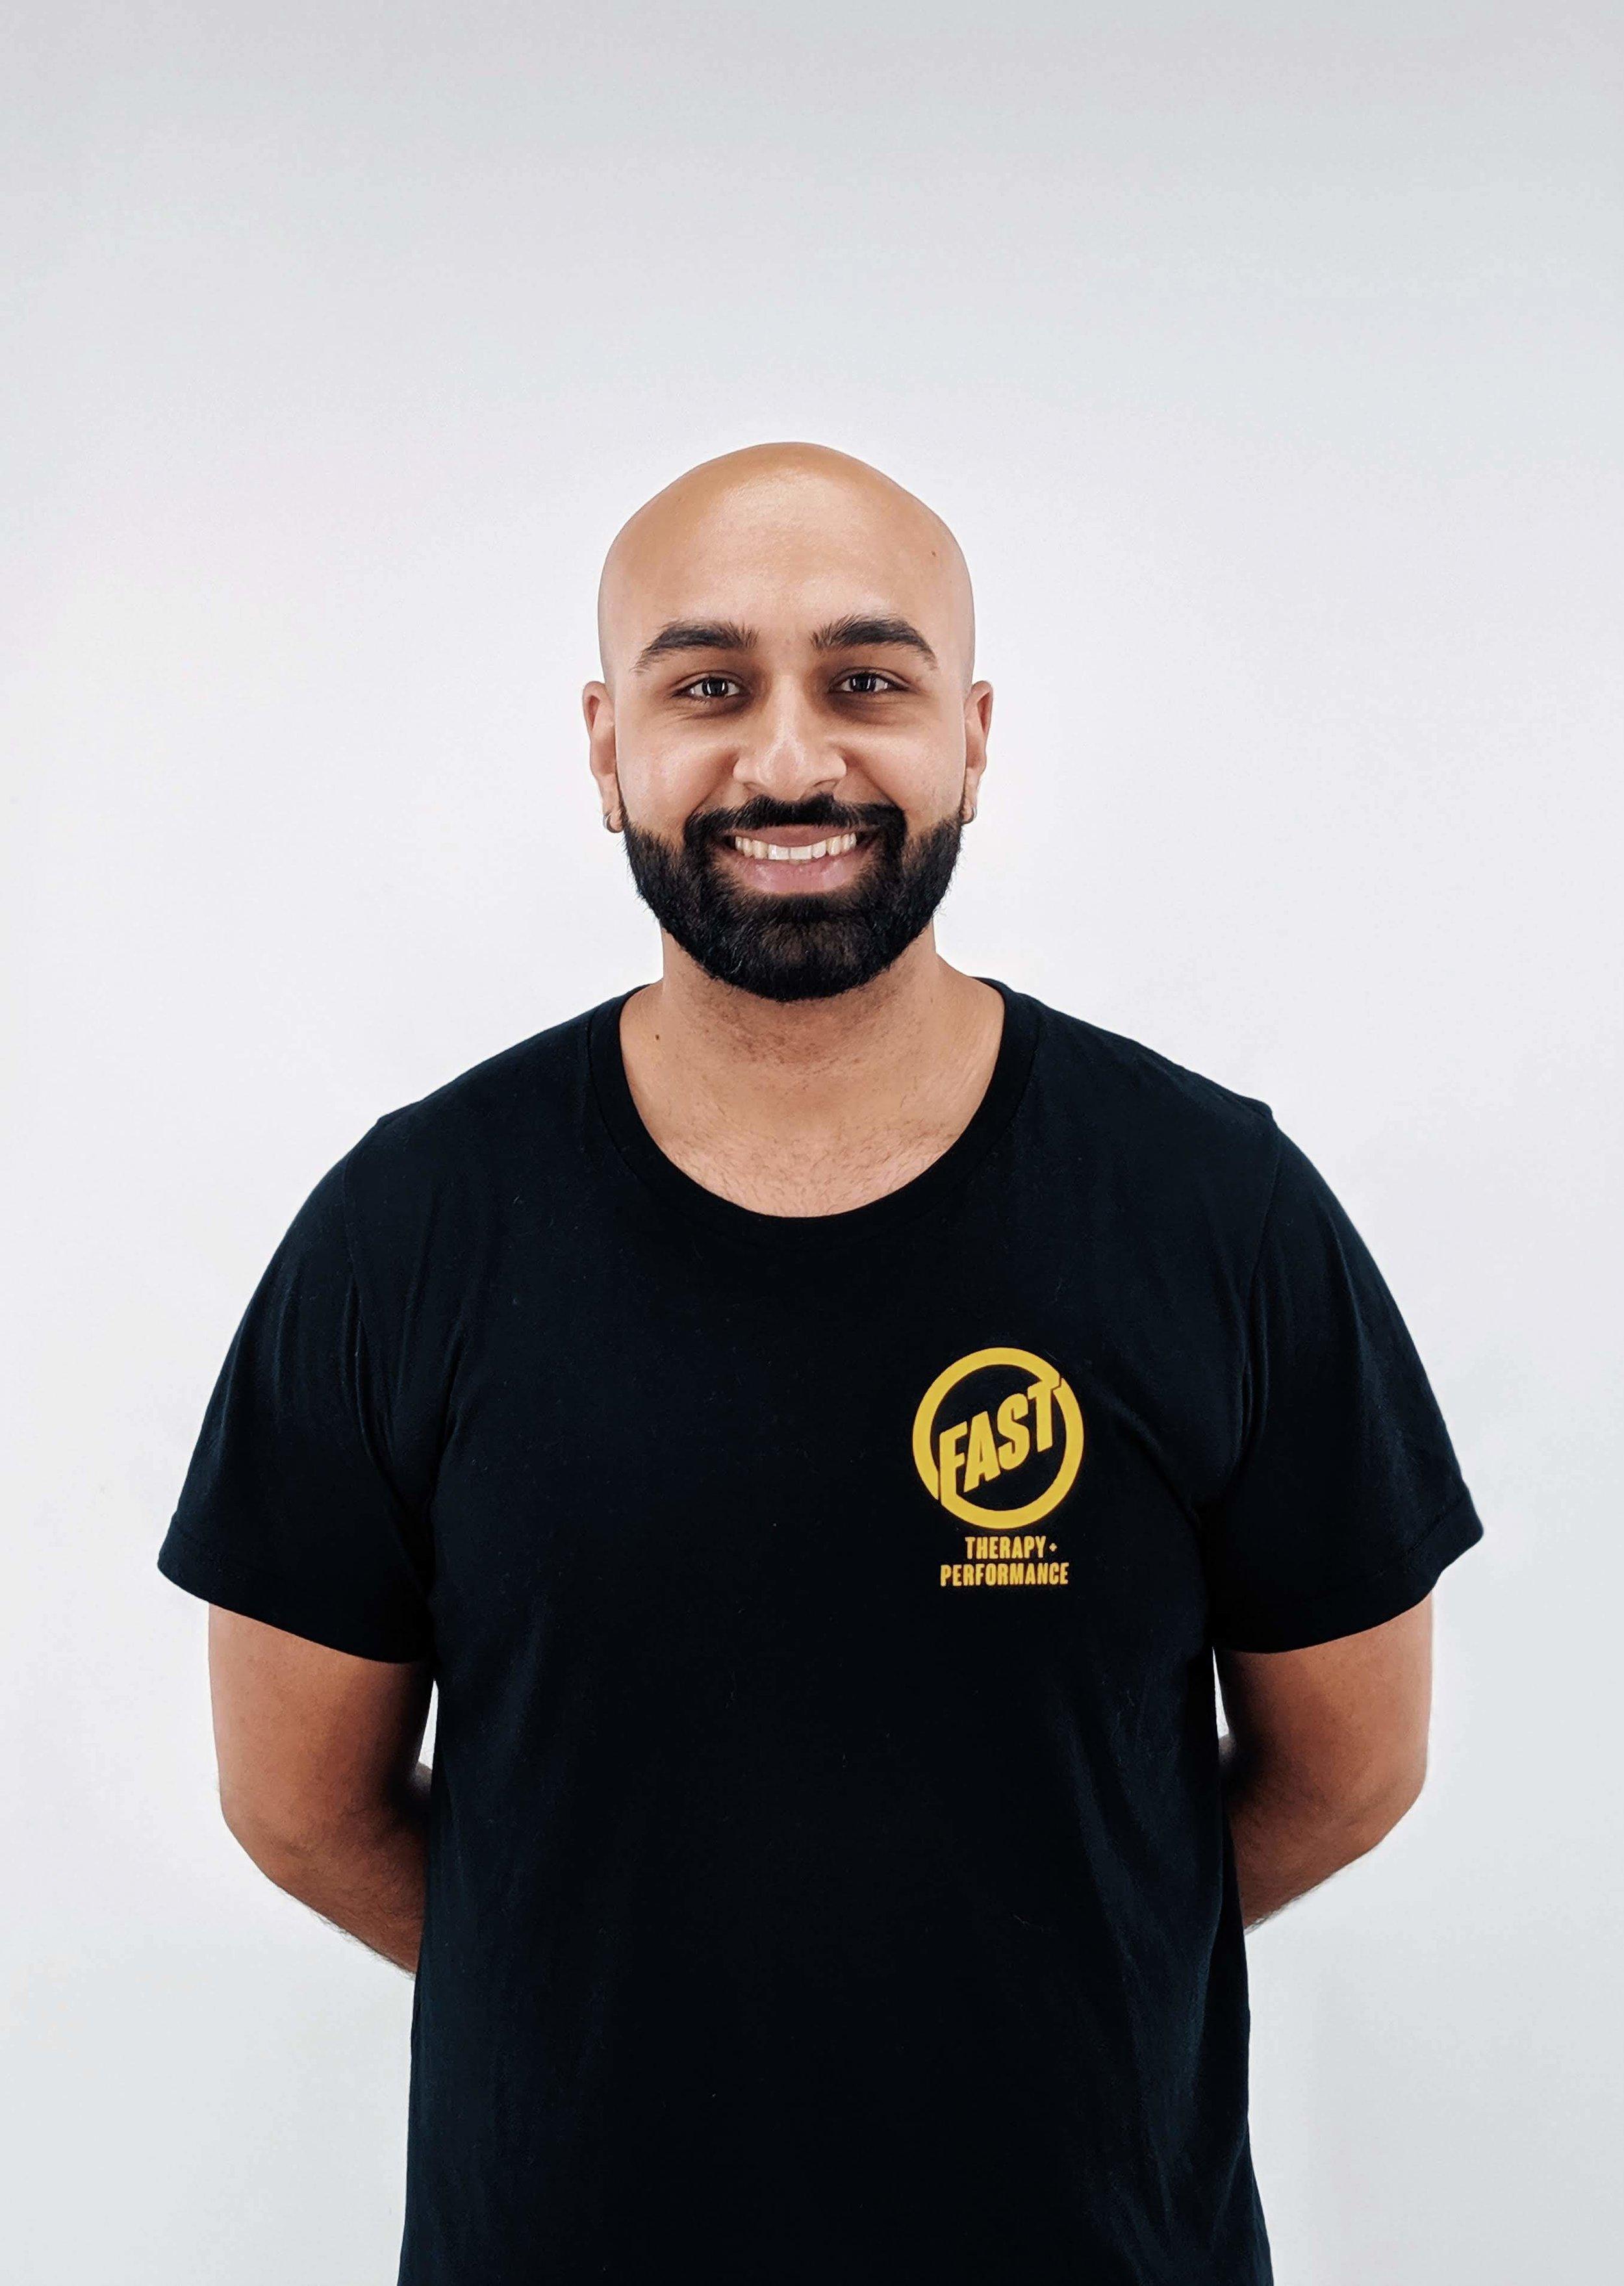 Dr. Ricky Singh